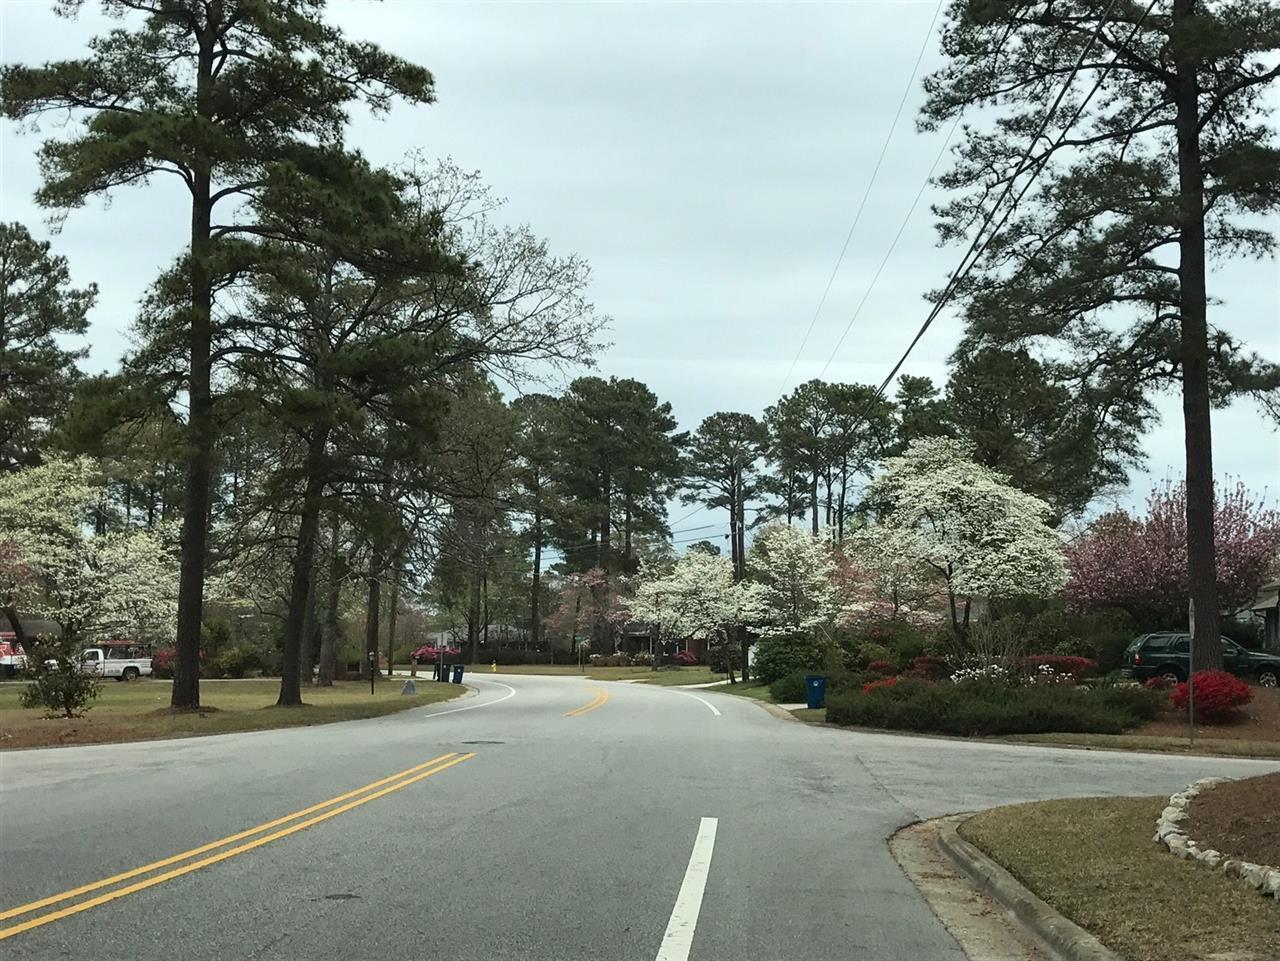 Spring in Fayetteville, North Carolina